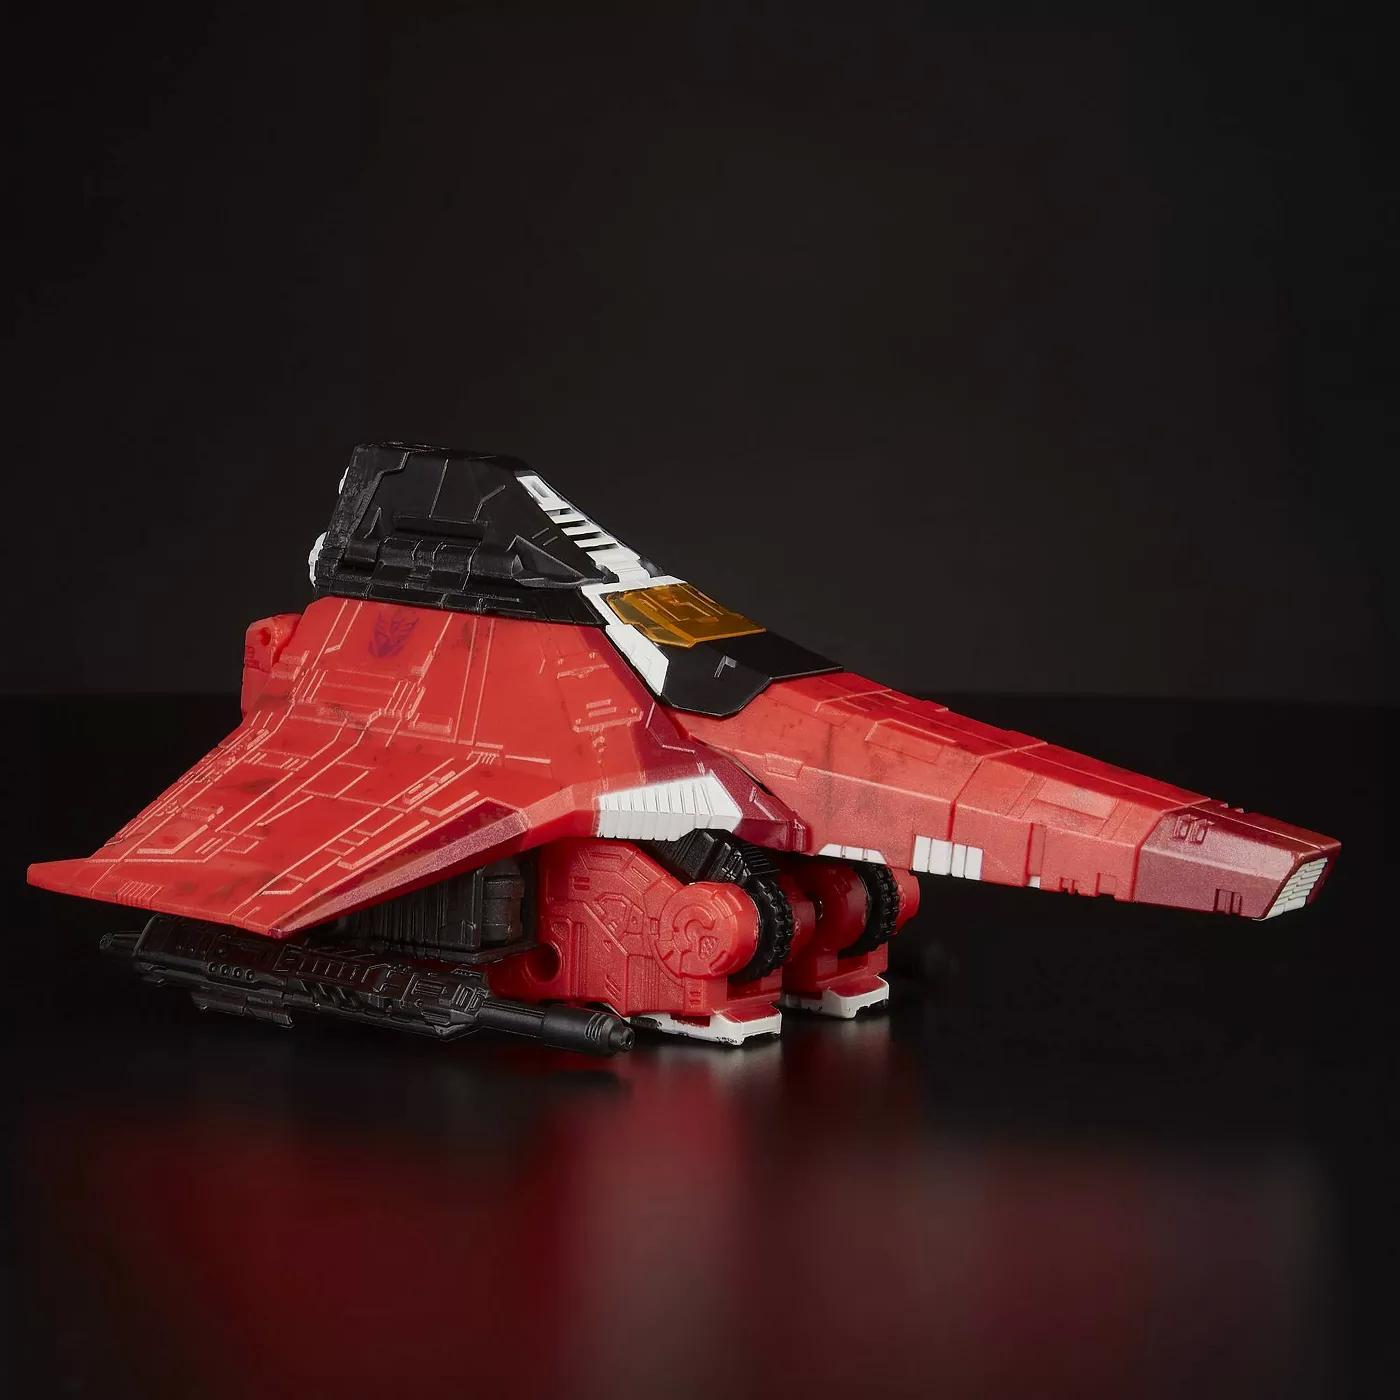 Transformers Wing War Voyager Hasbro